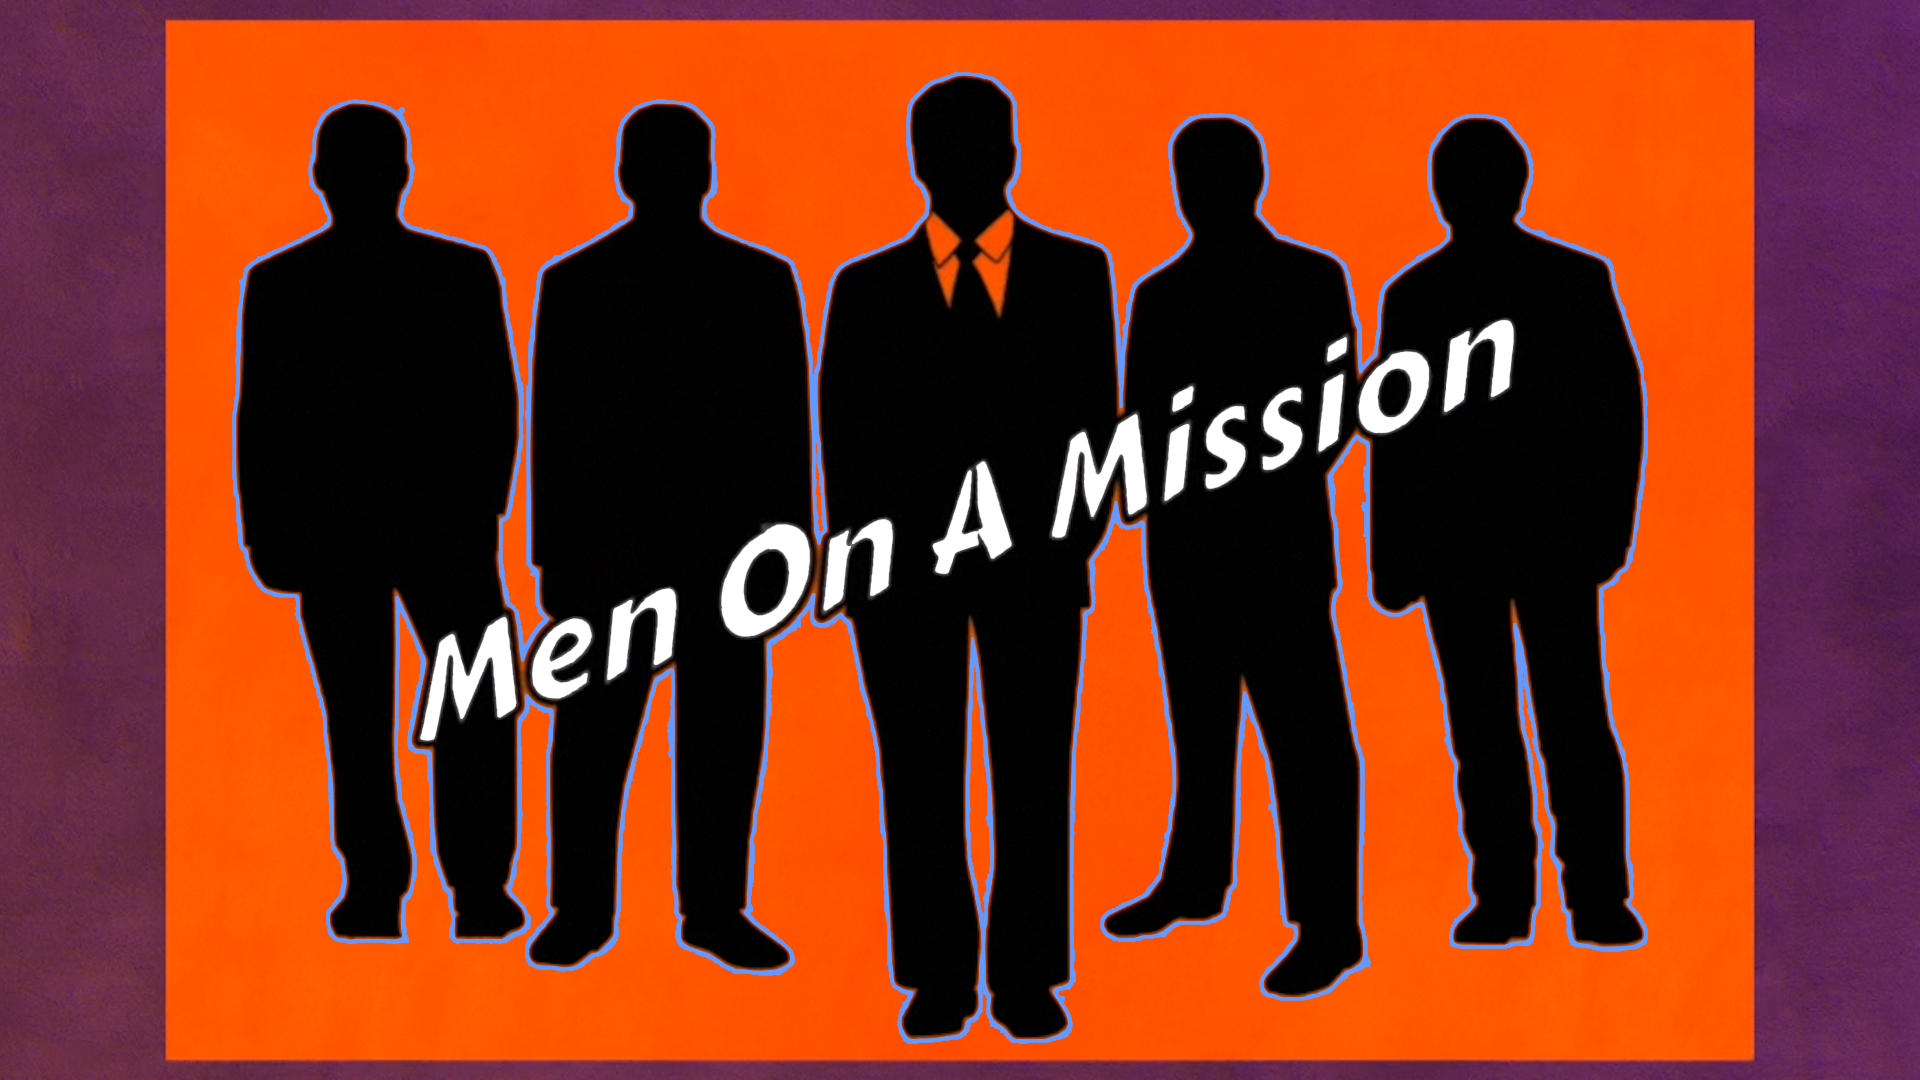 Men on a Mission S2E2